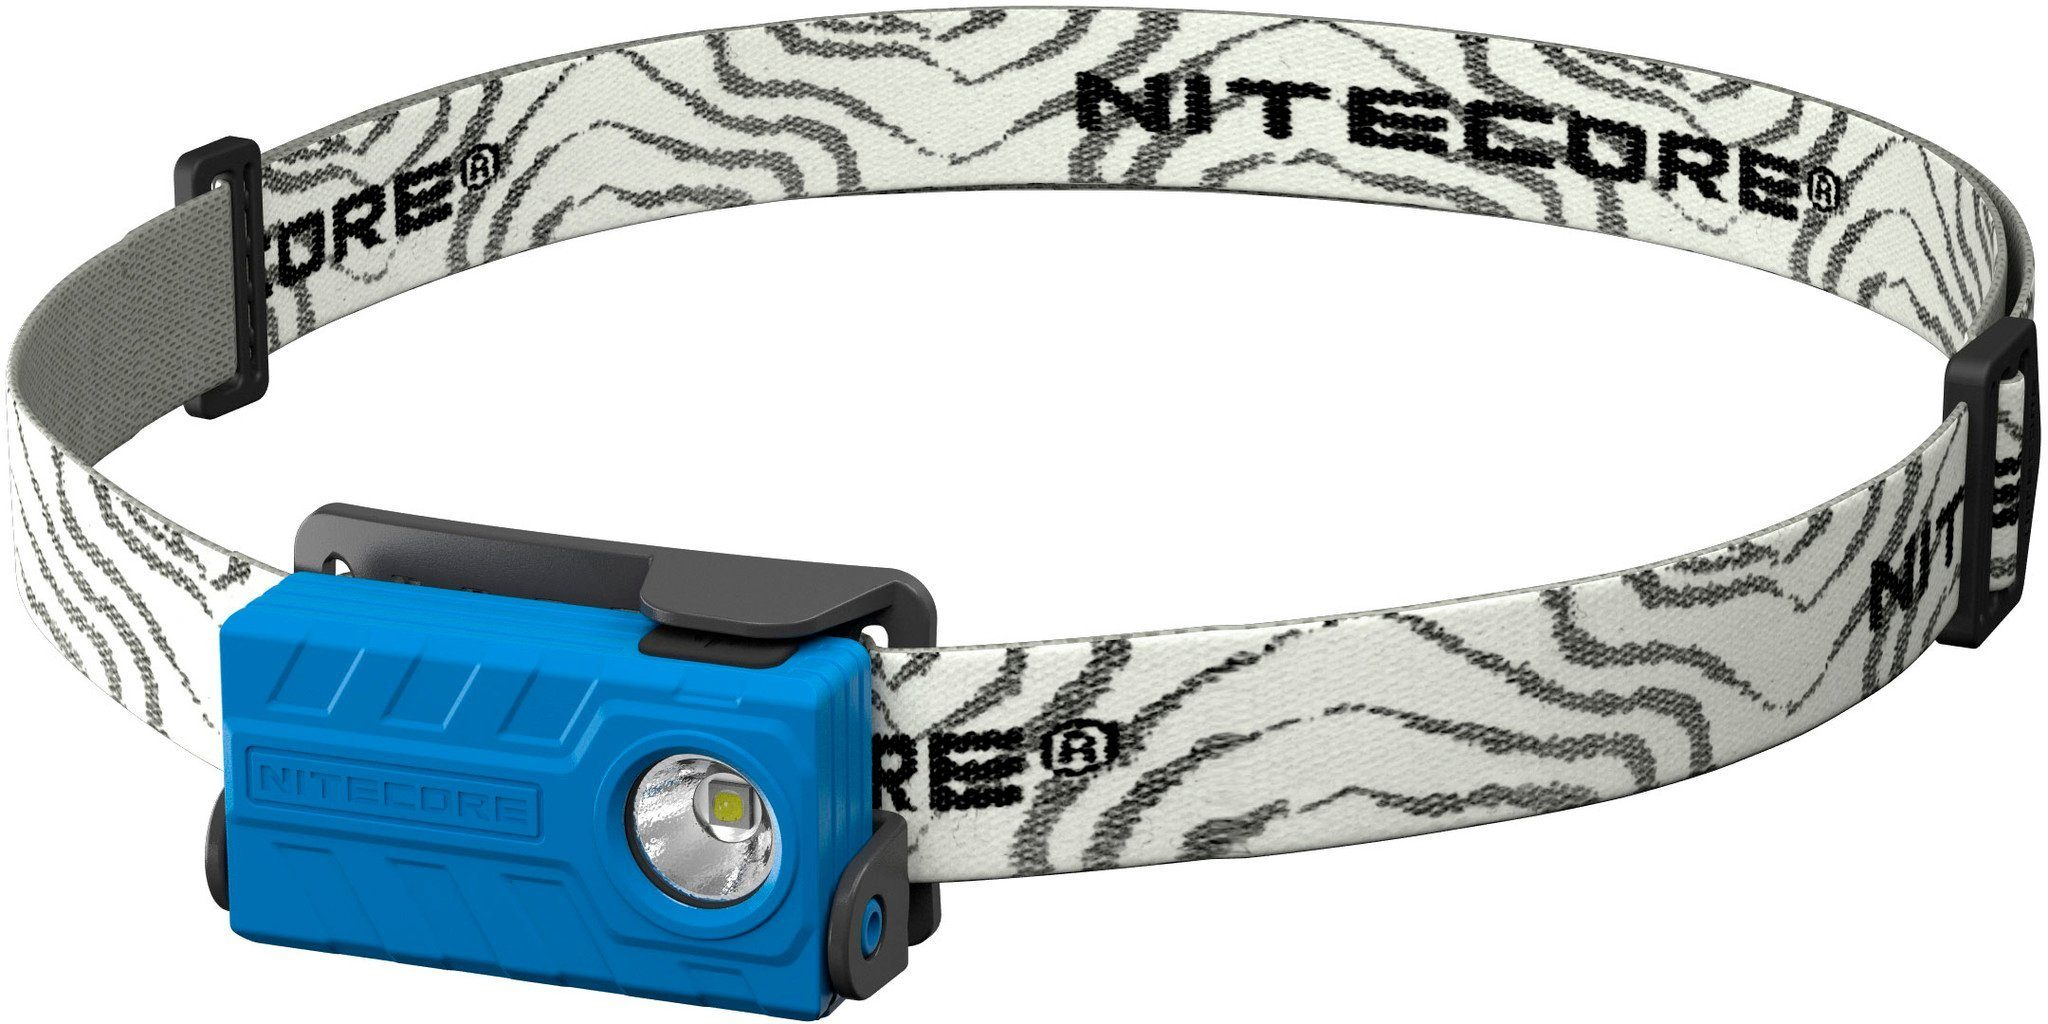 Nitecore Camping-Beleuchtung »NU20 LED Stirnlampe«